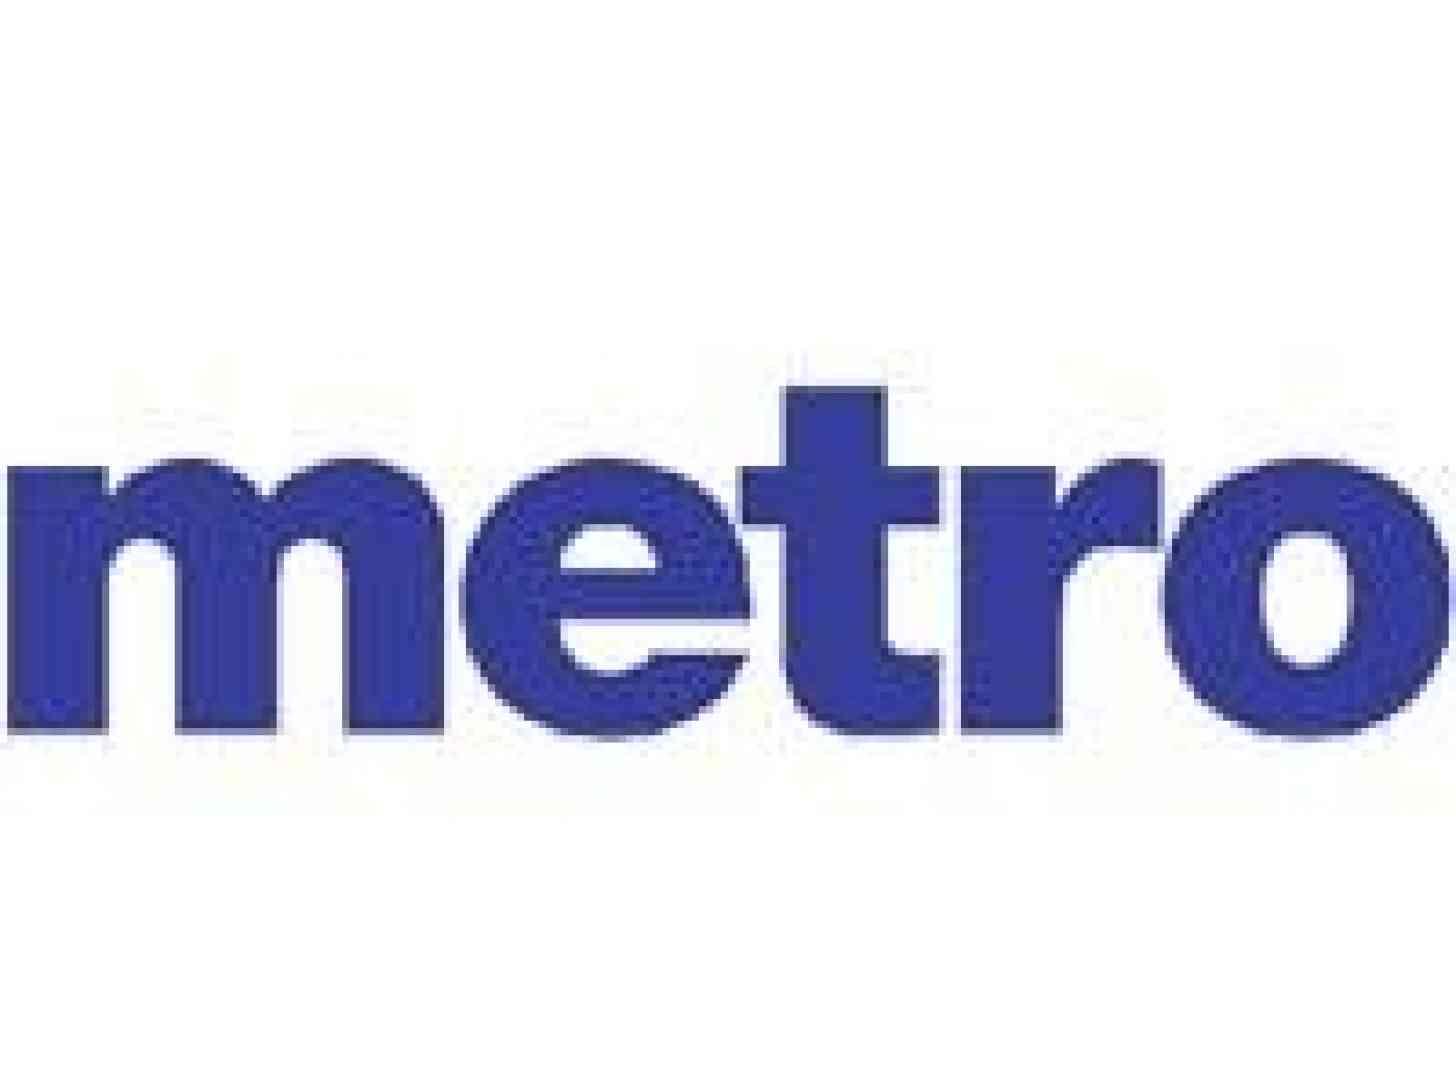 Samsung Galaxy Attain 4G, LG Connect 4G headed to MetroPCS